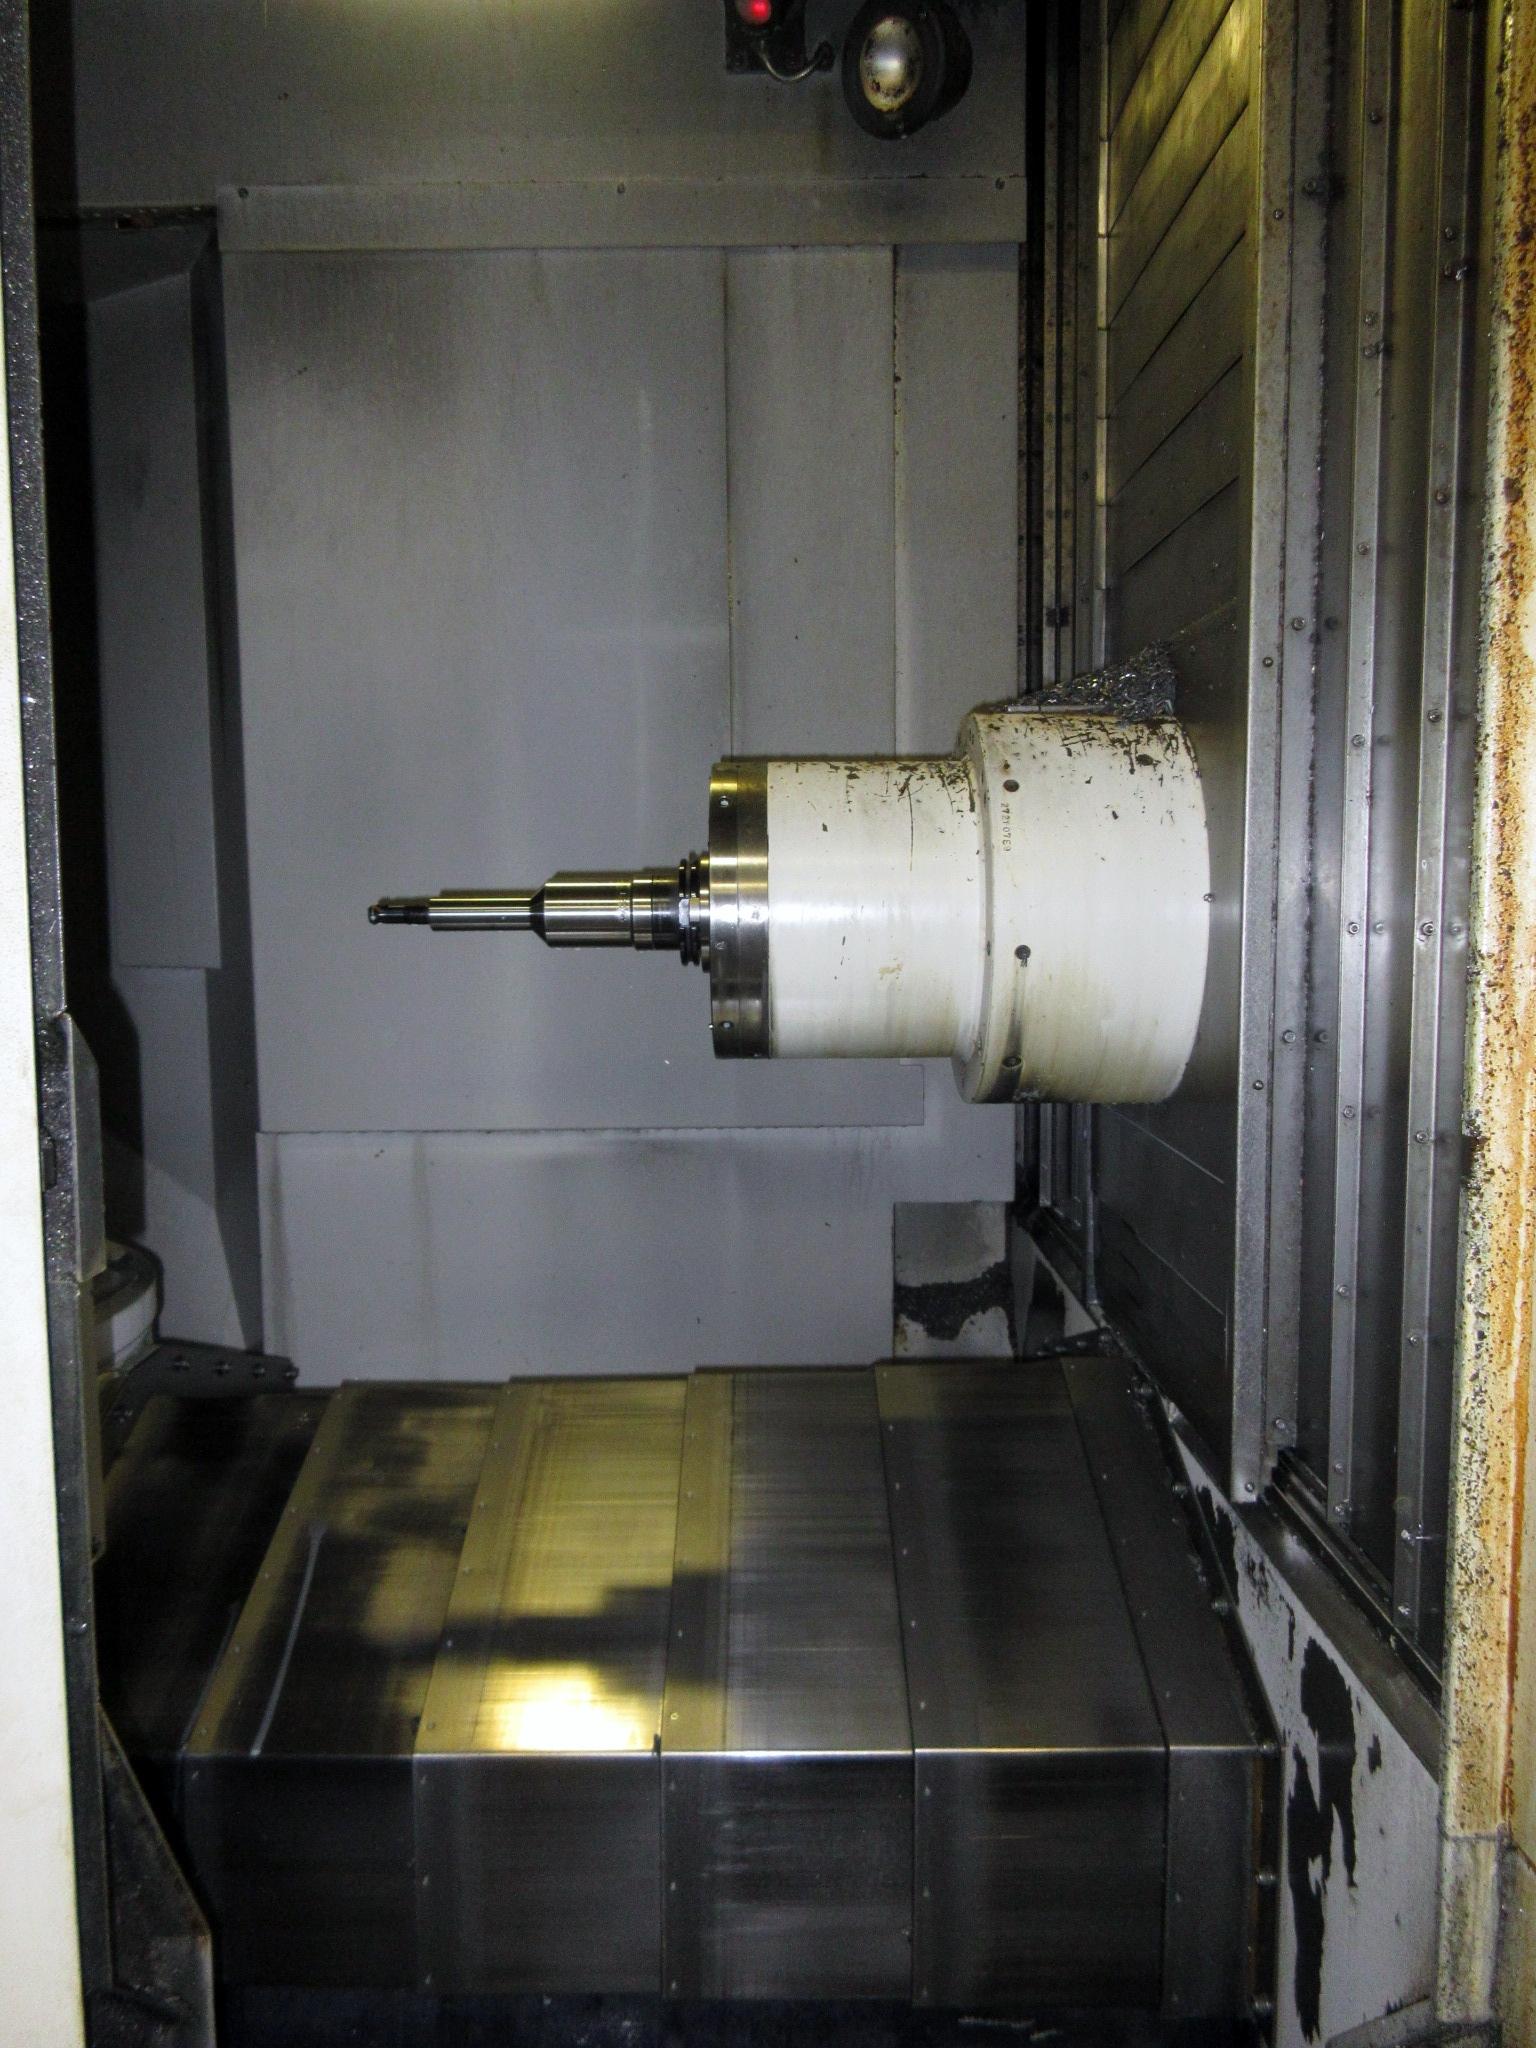 Mazak HCN-6000-II CNC Horizontal Machining Center With Palletech System - Image 5 of 22